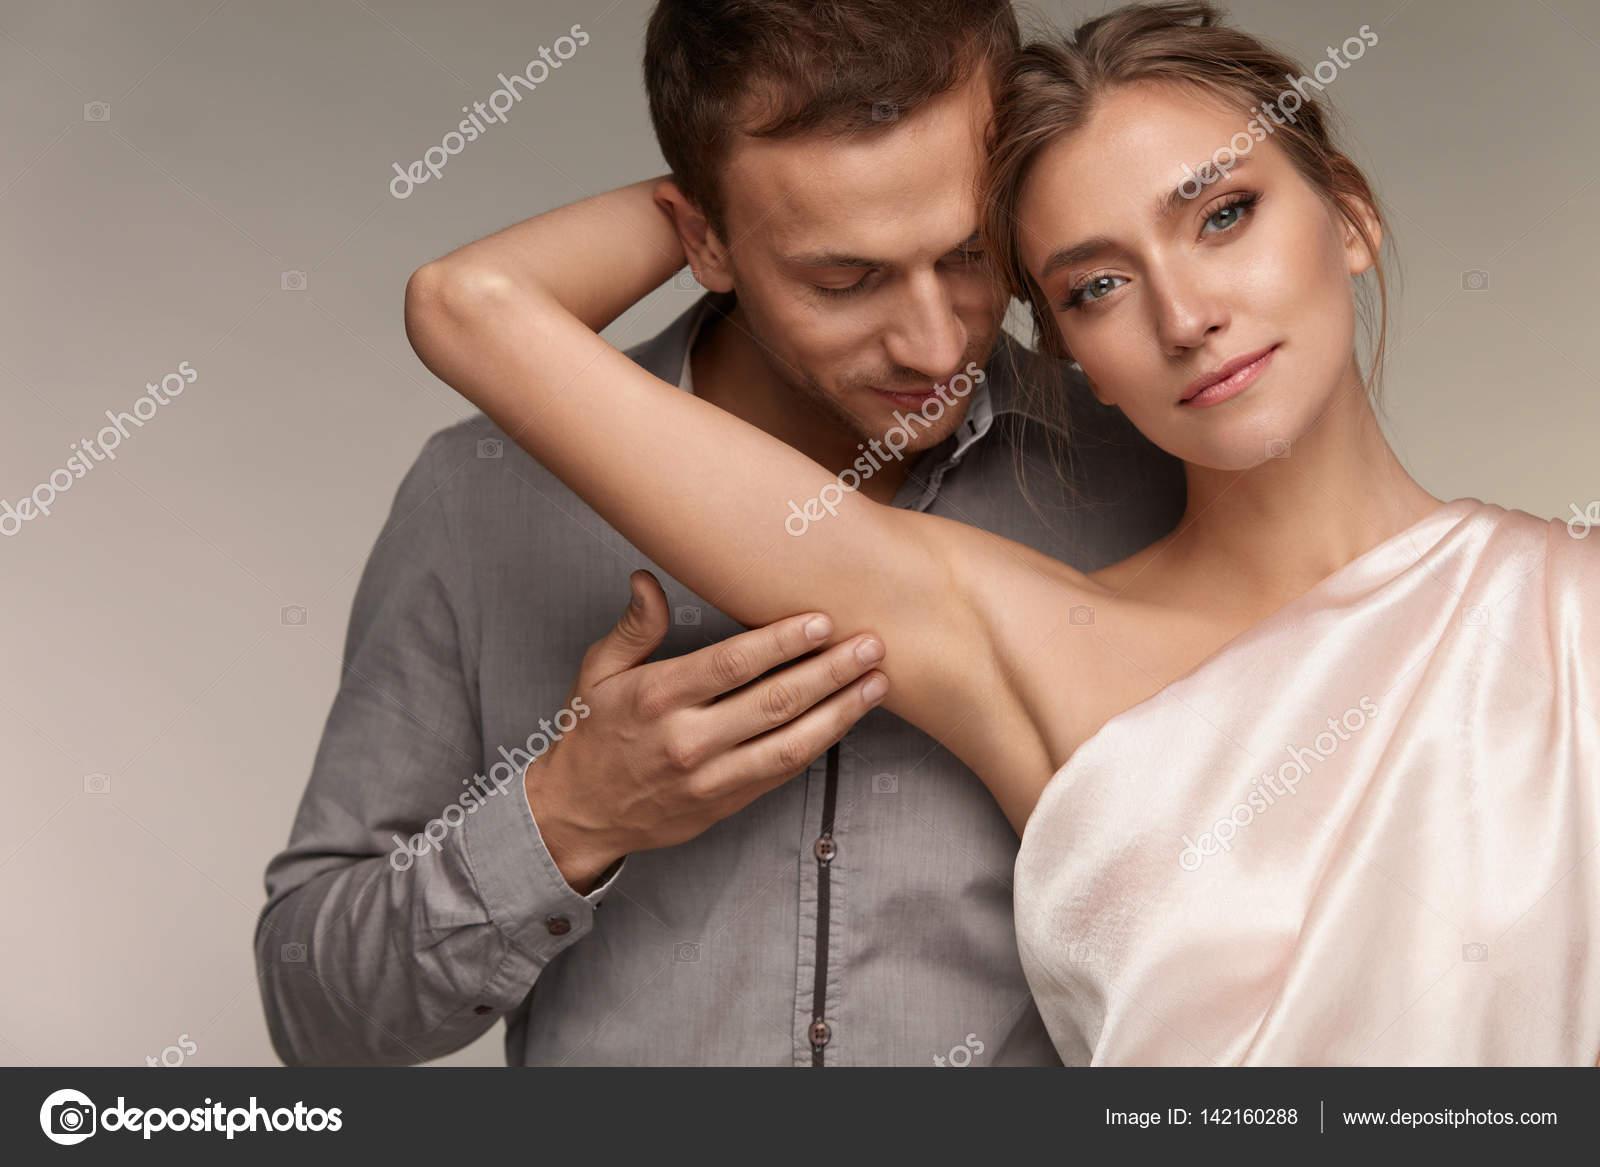 mjuk dating Hesperia dating